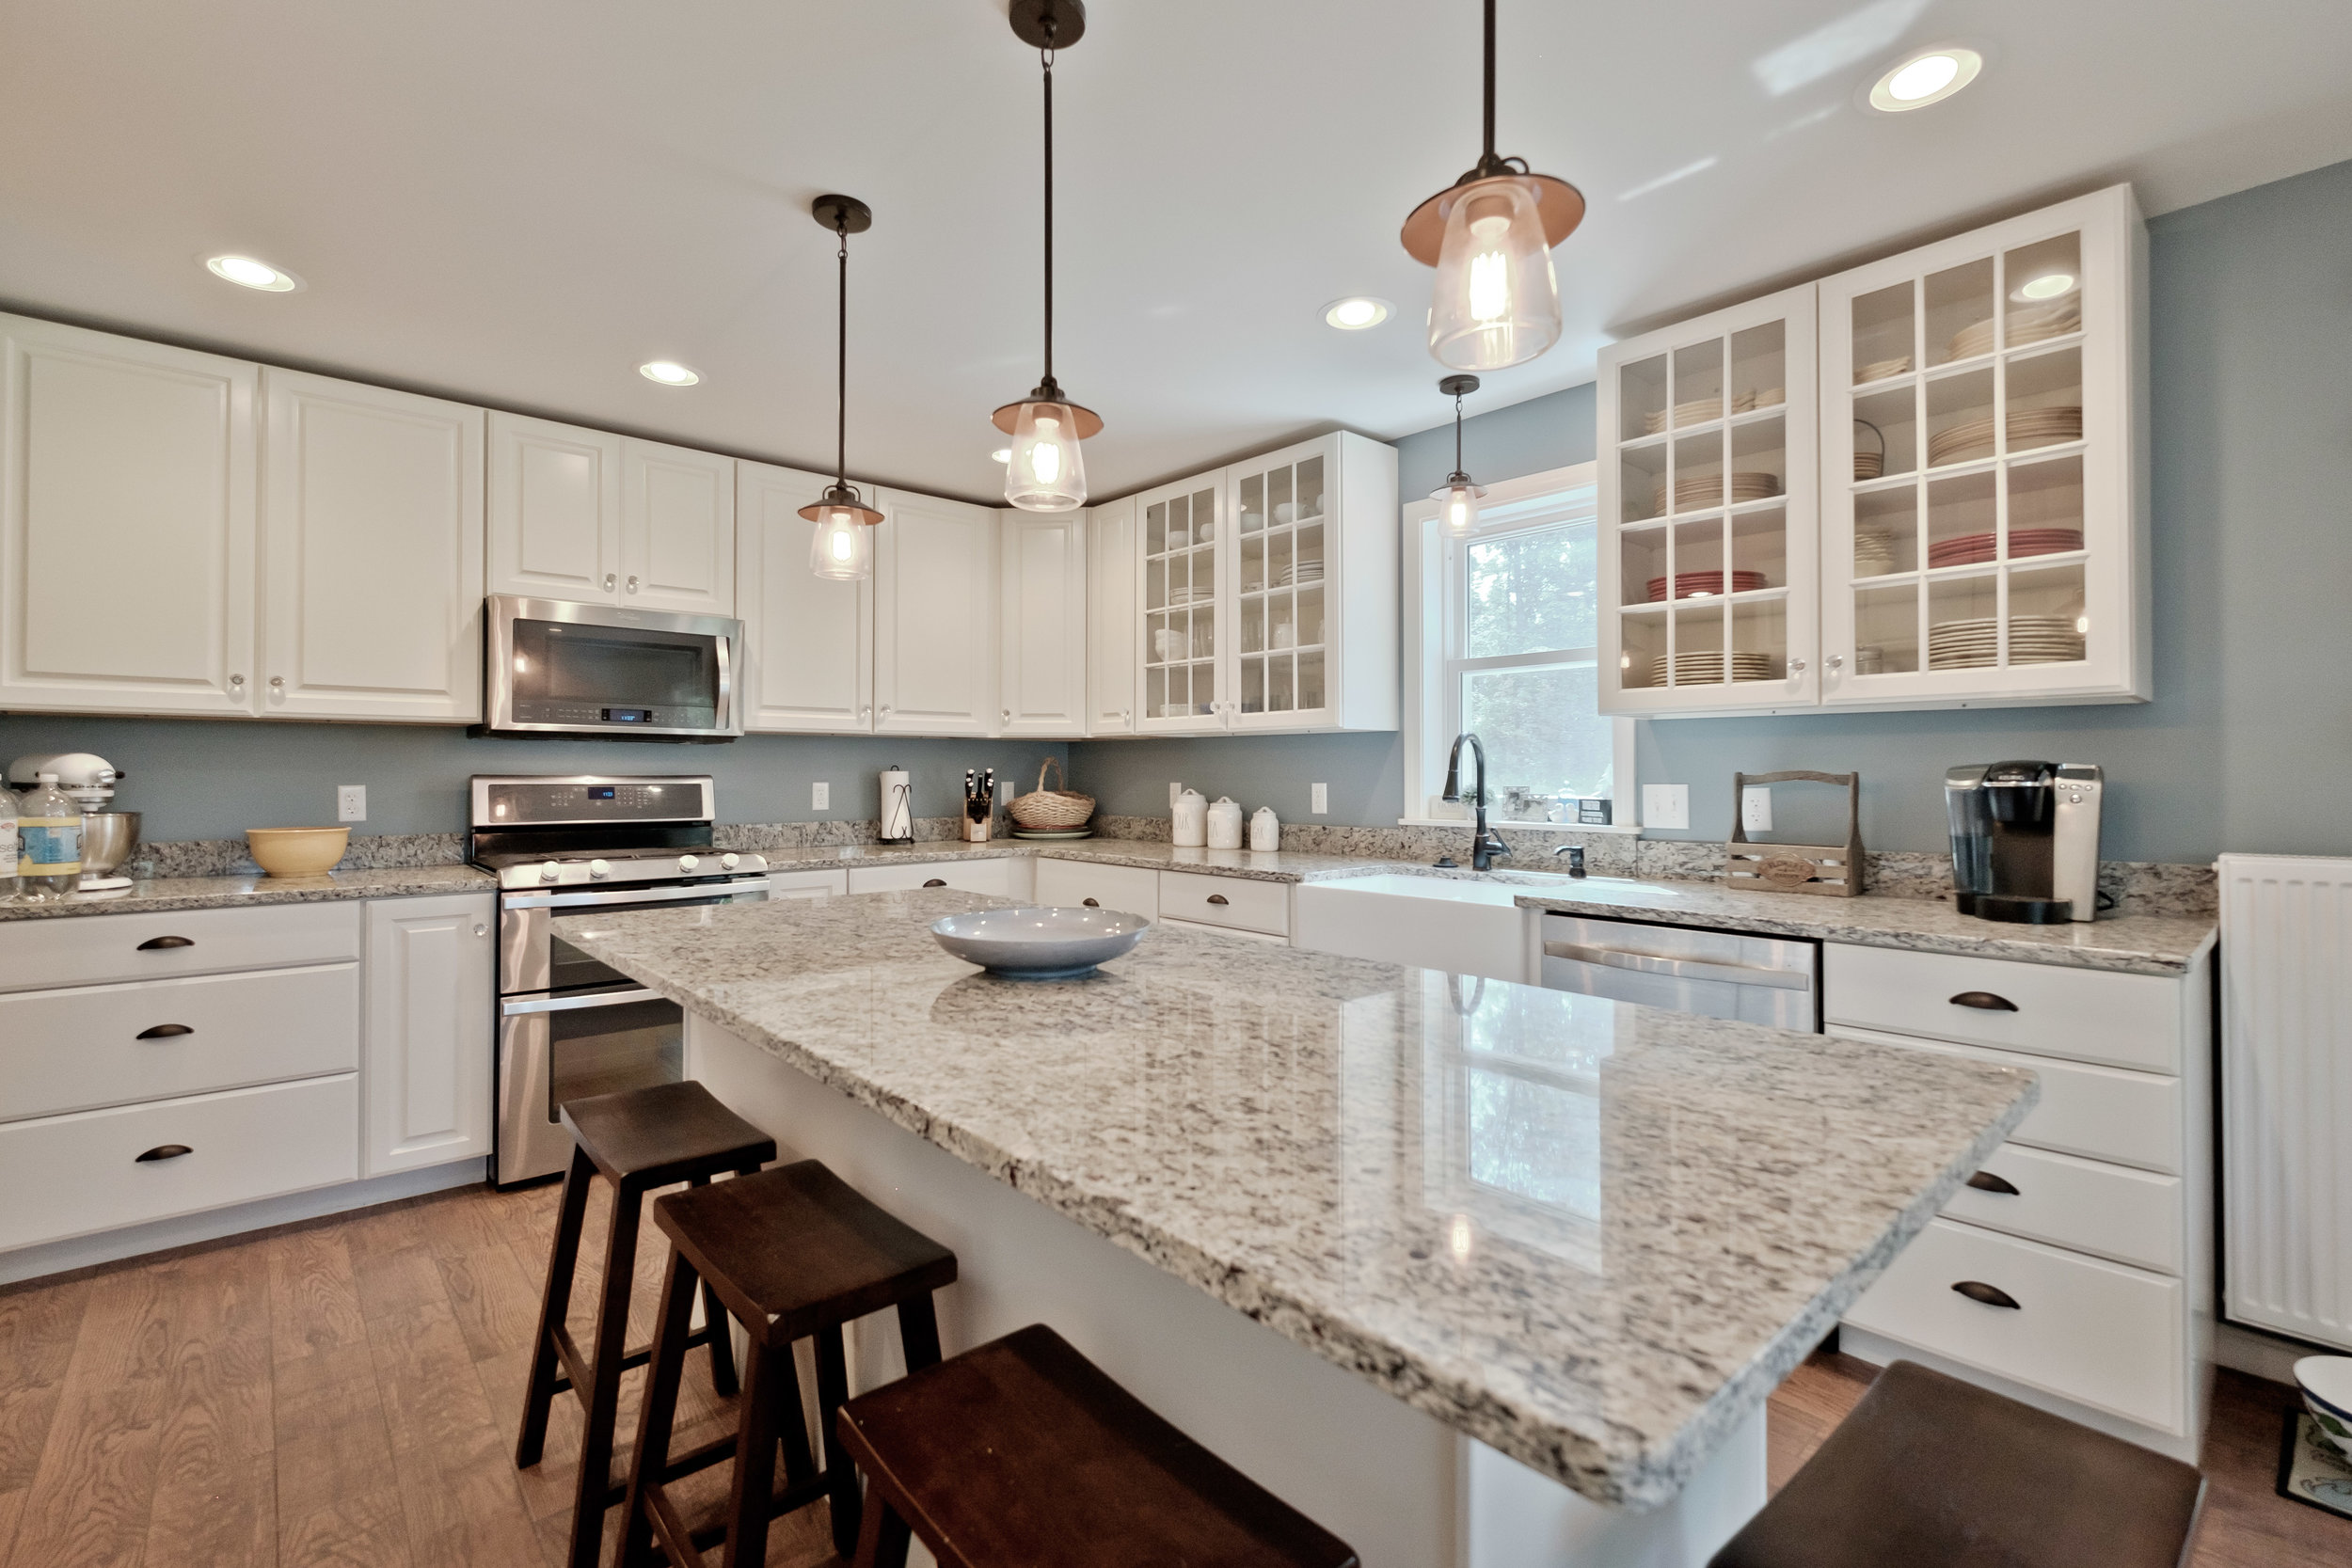 Red Barn House Mottram Architecture | Emily Mottram Energy Efficient Architect